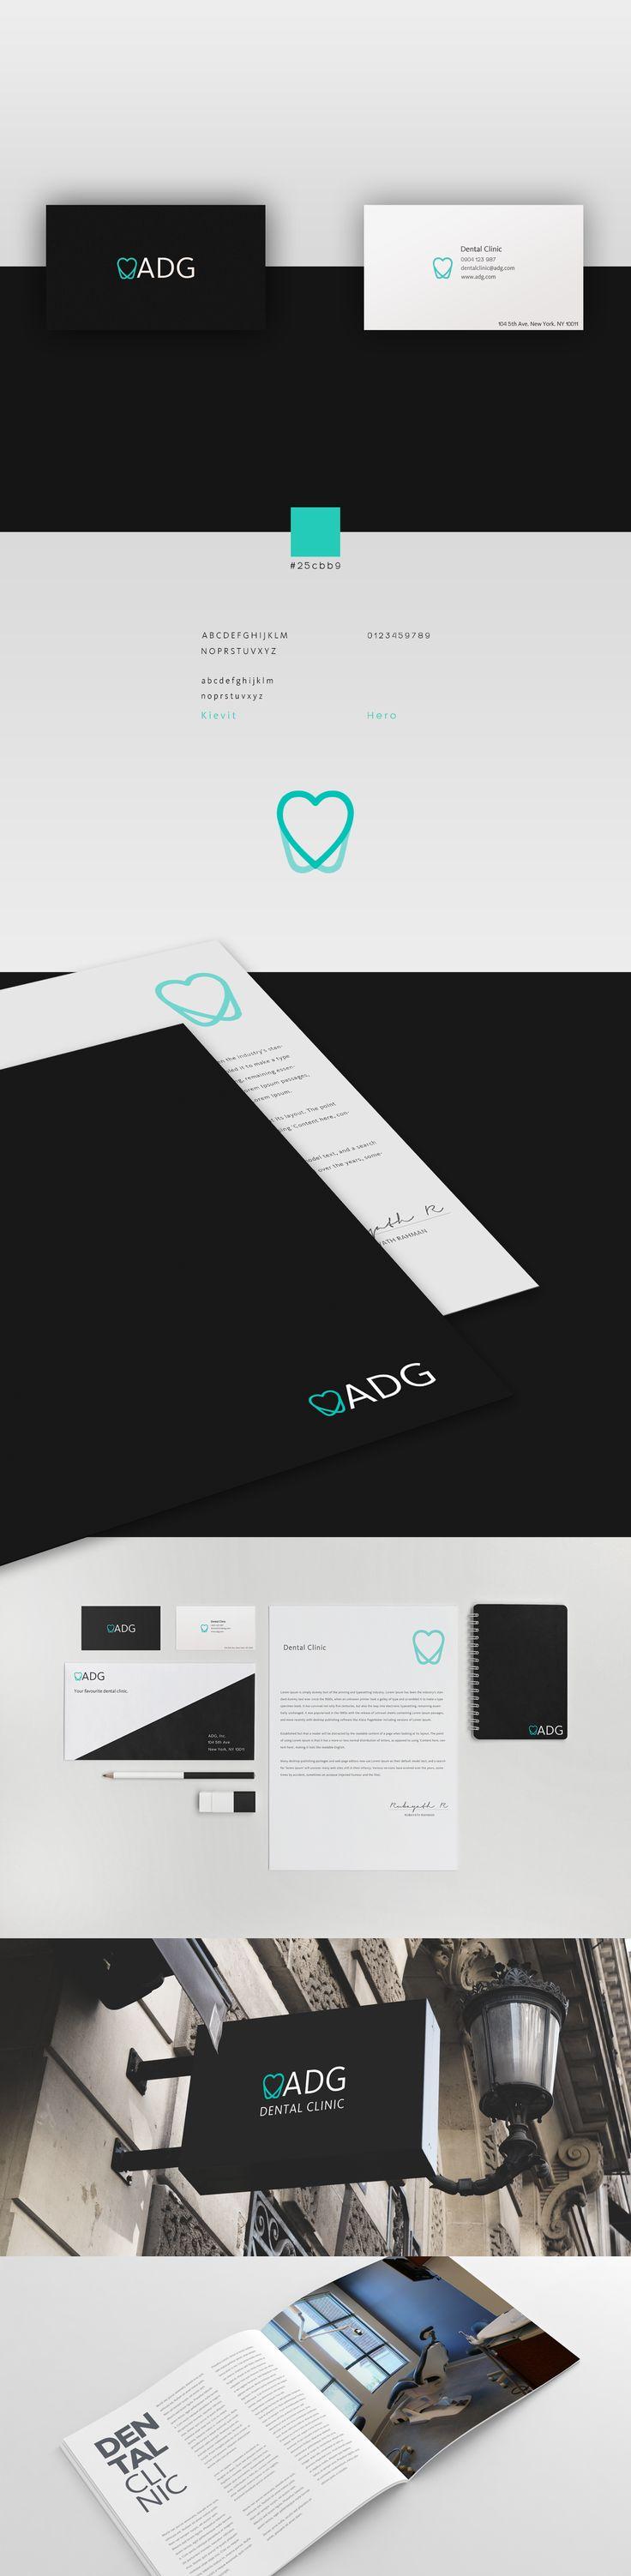 ADG Dental Clinic branding.. If you like UX, design, or